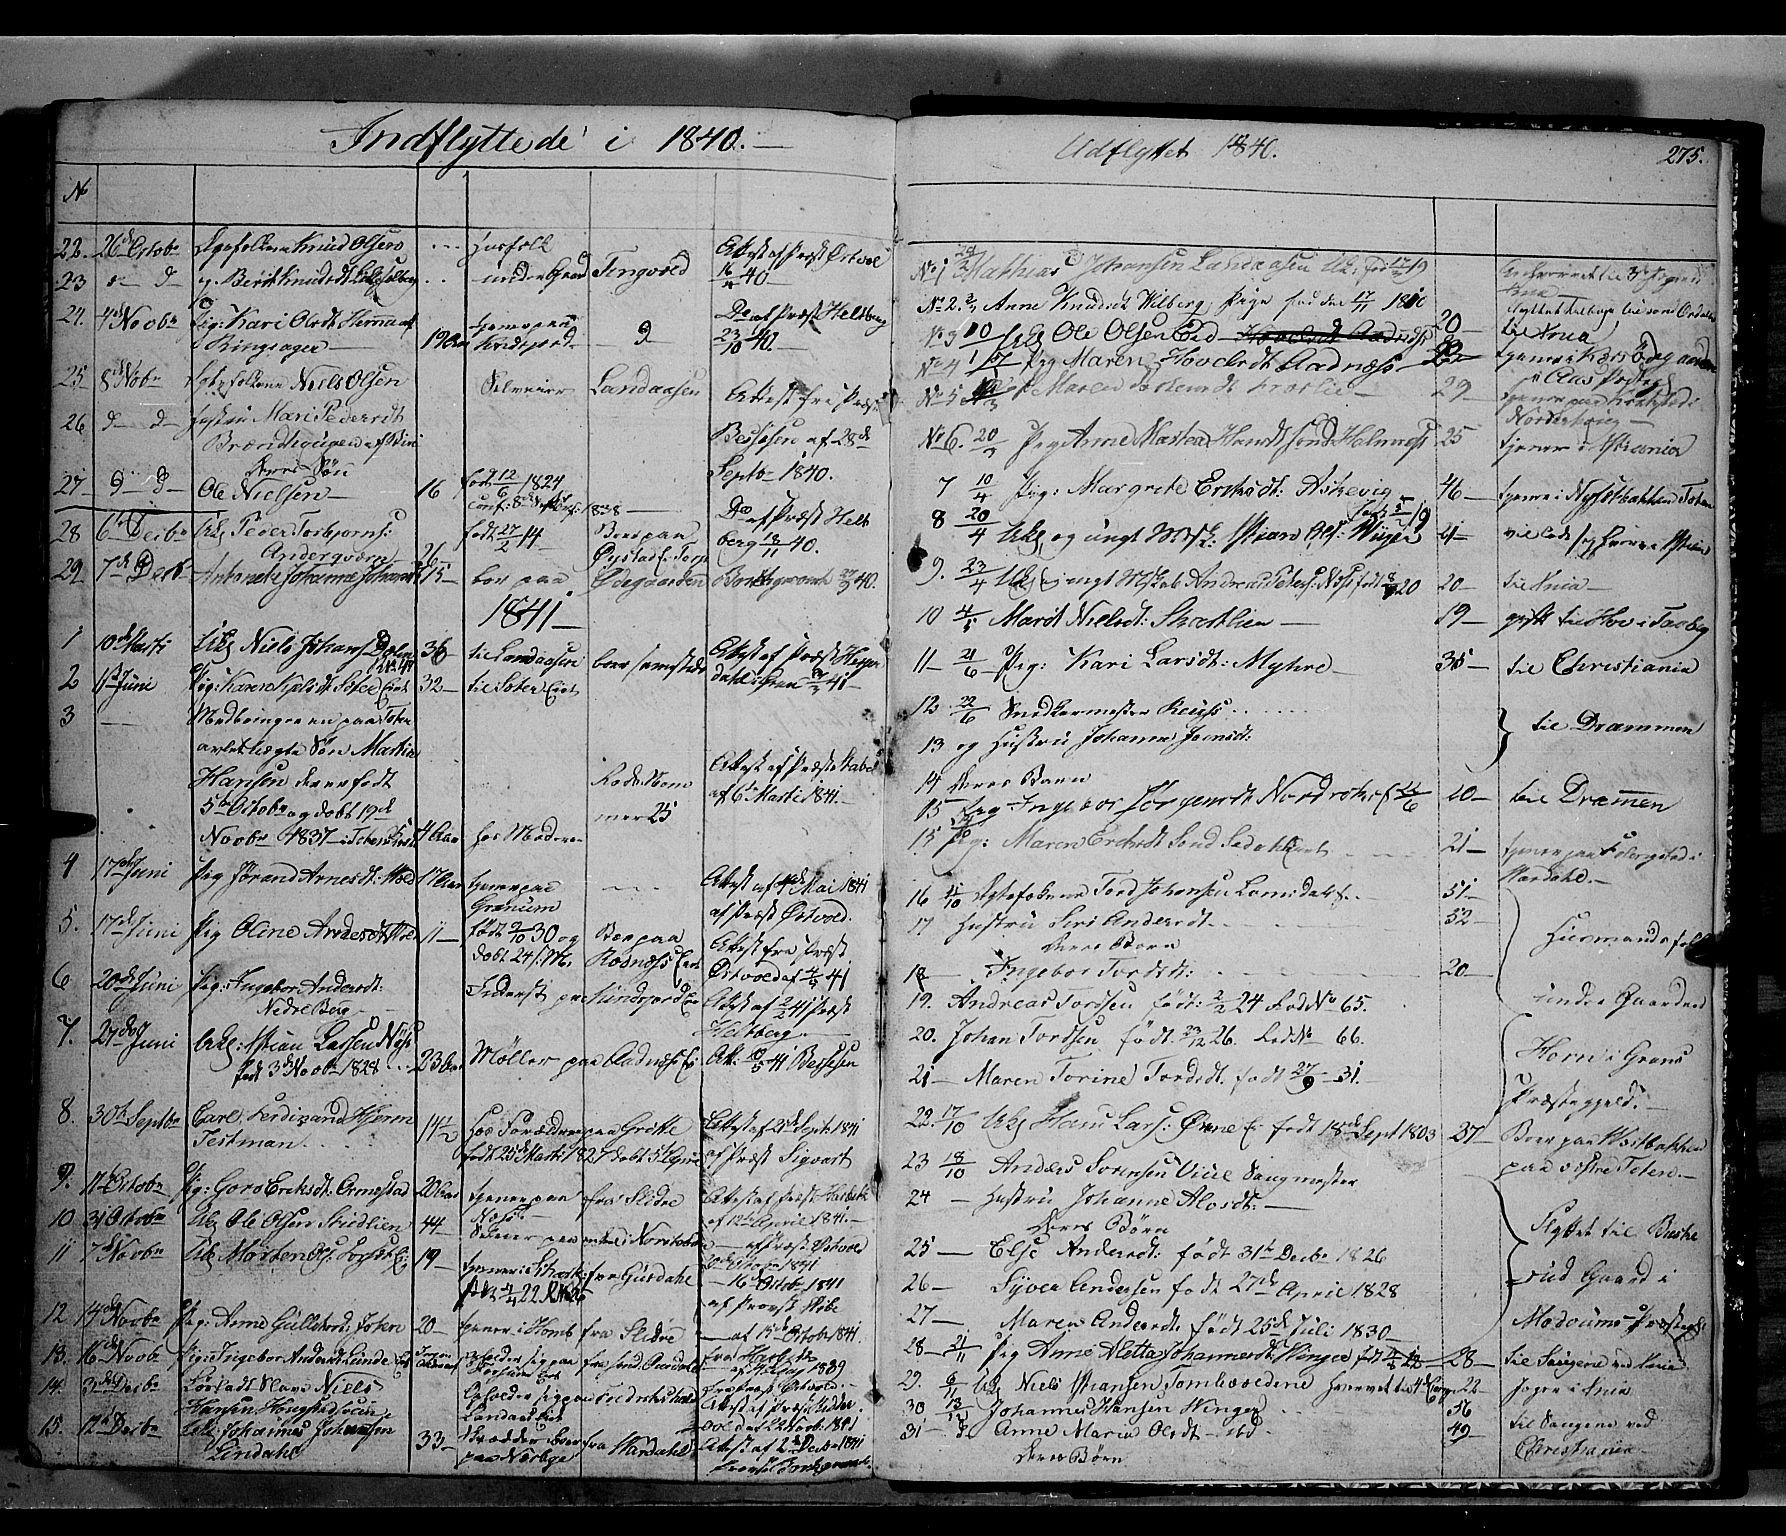 SAH, Land prestekontor, Klokkerbok nr. 2, 1833-1849, s. 275